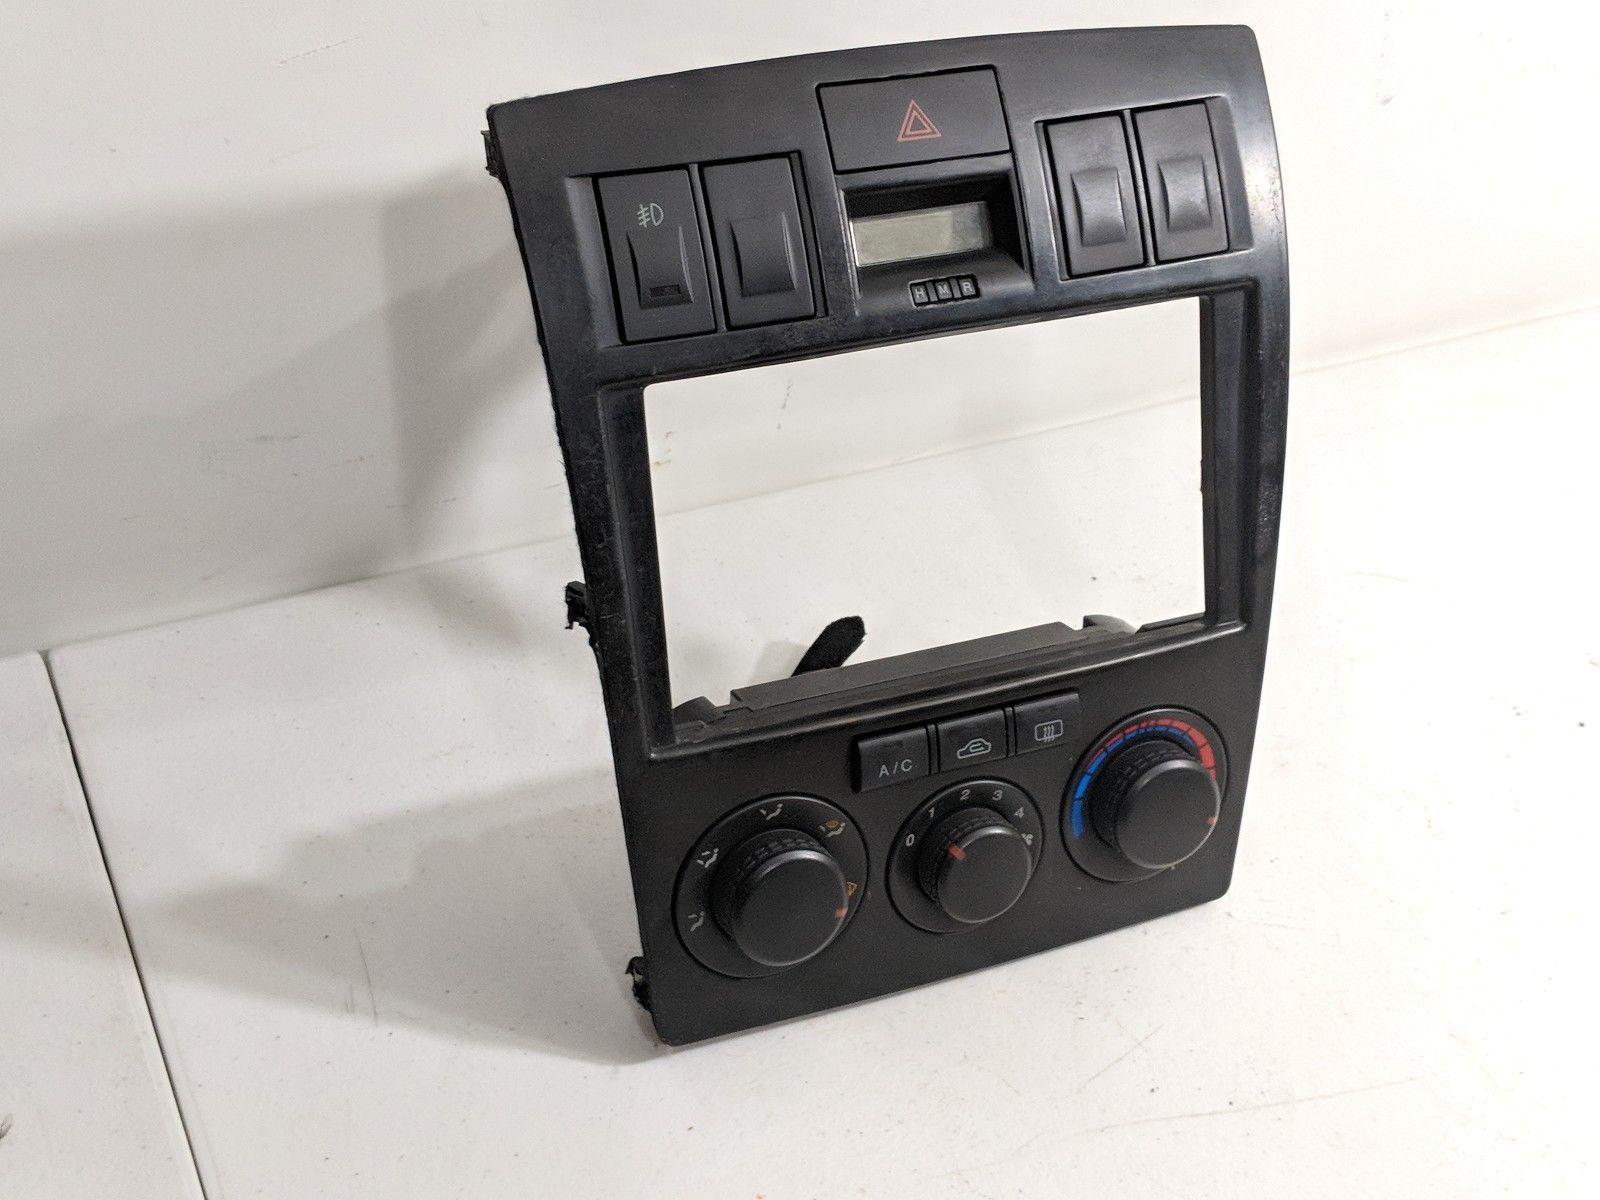 05 06 07 08 09 Dodge Durango Climate Control Panel Temperature Unit A//C Heater